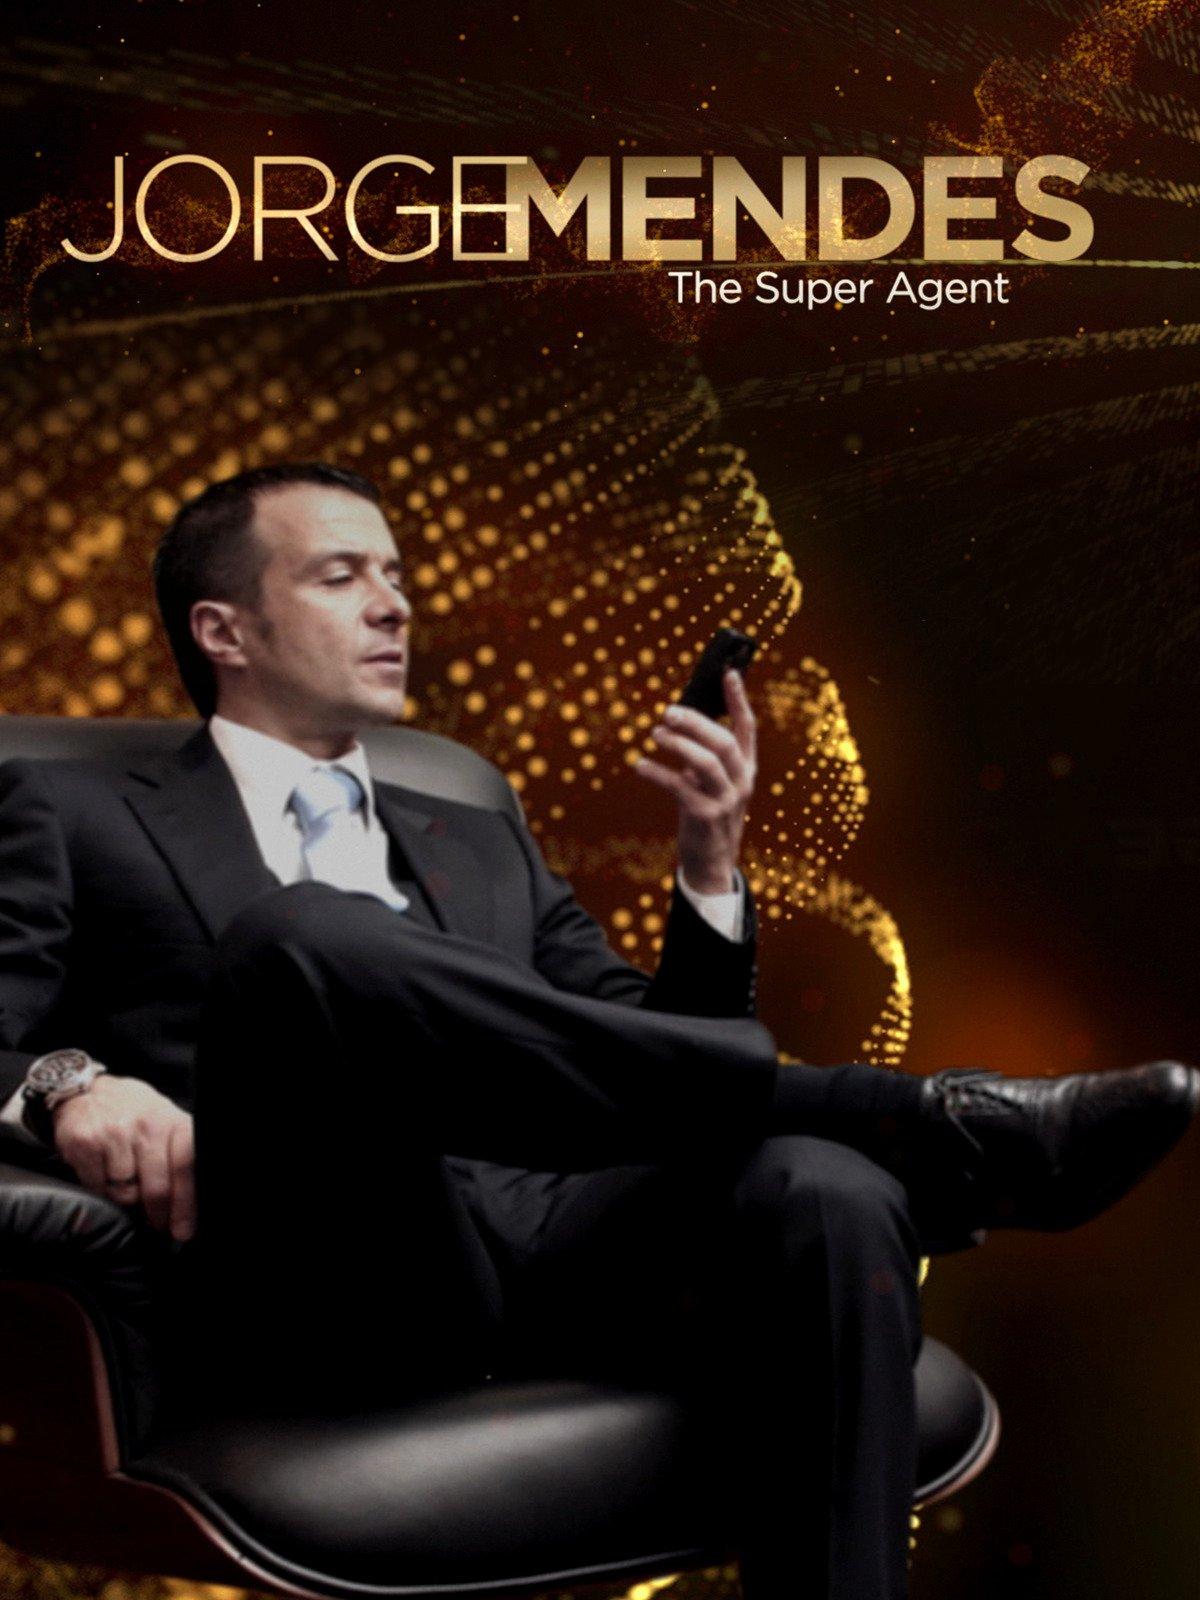 Jorge Mendes